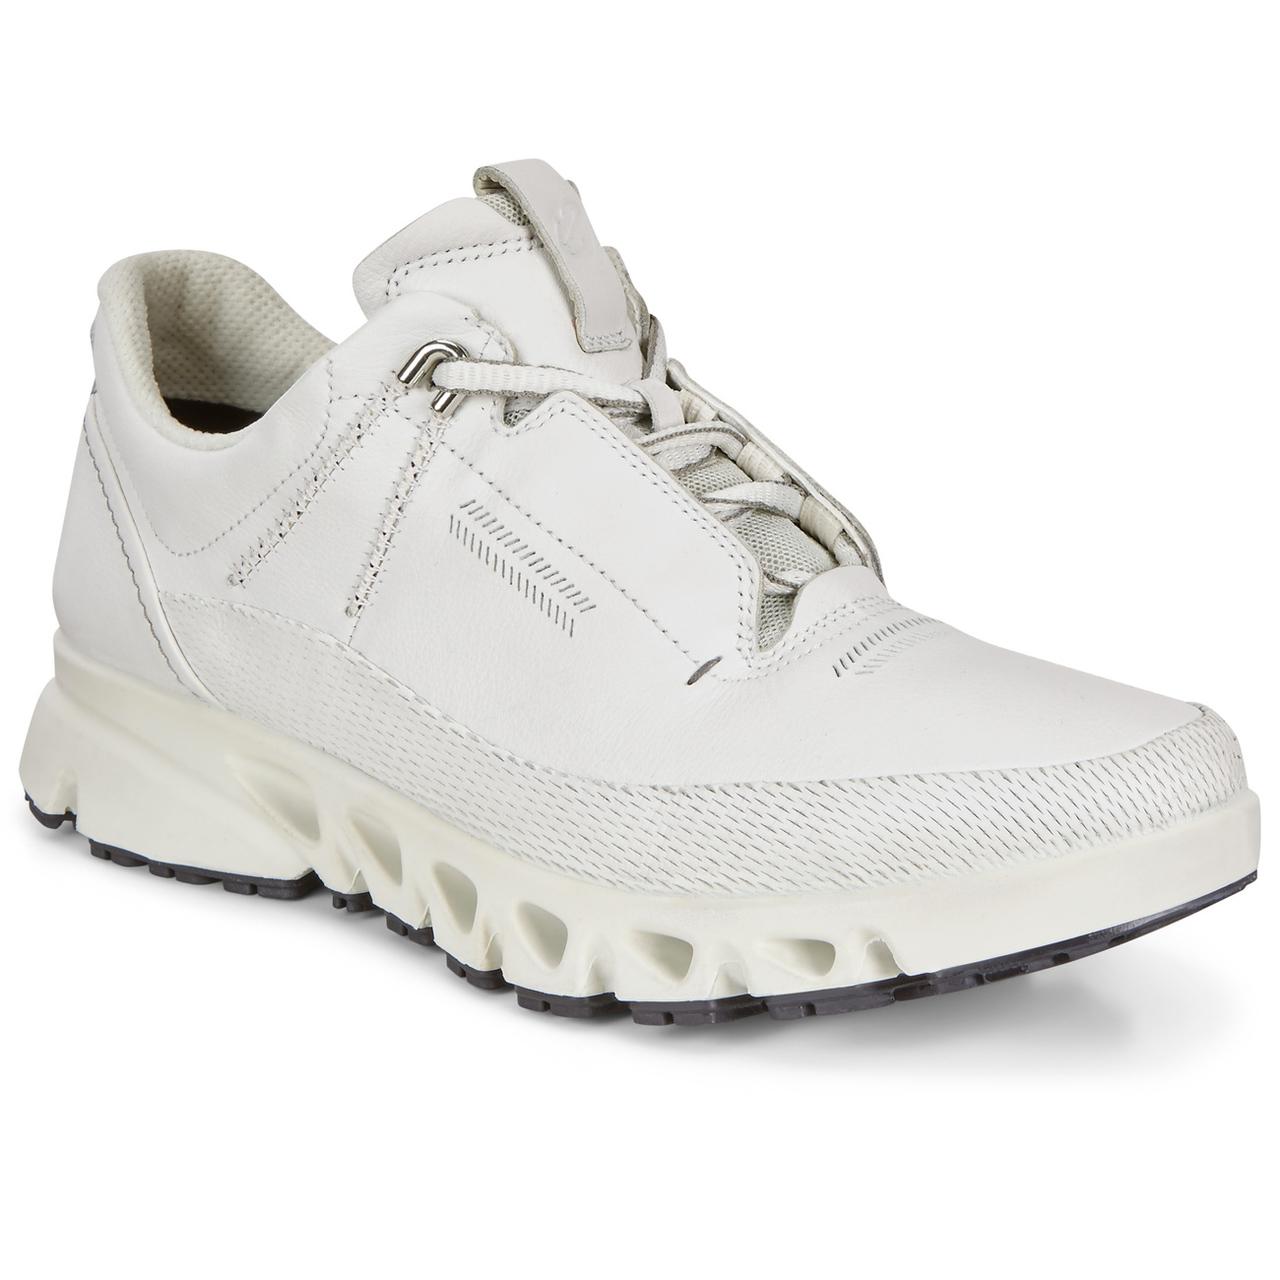 ecco athletic shoes